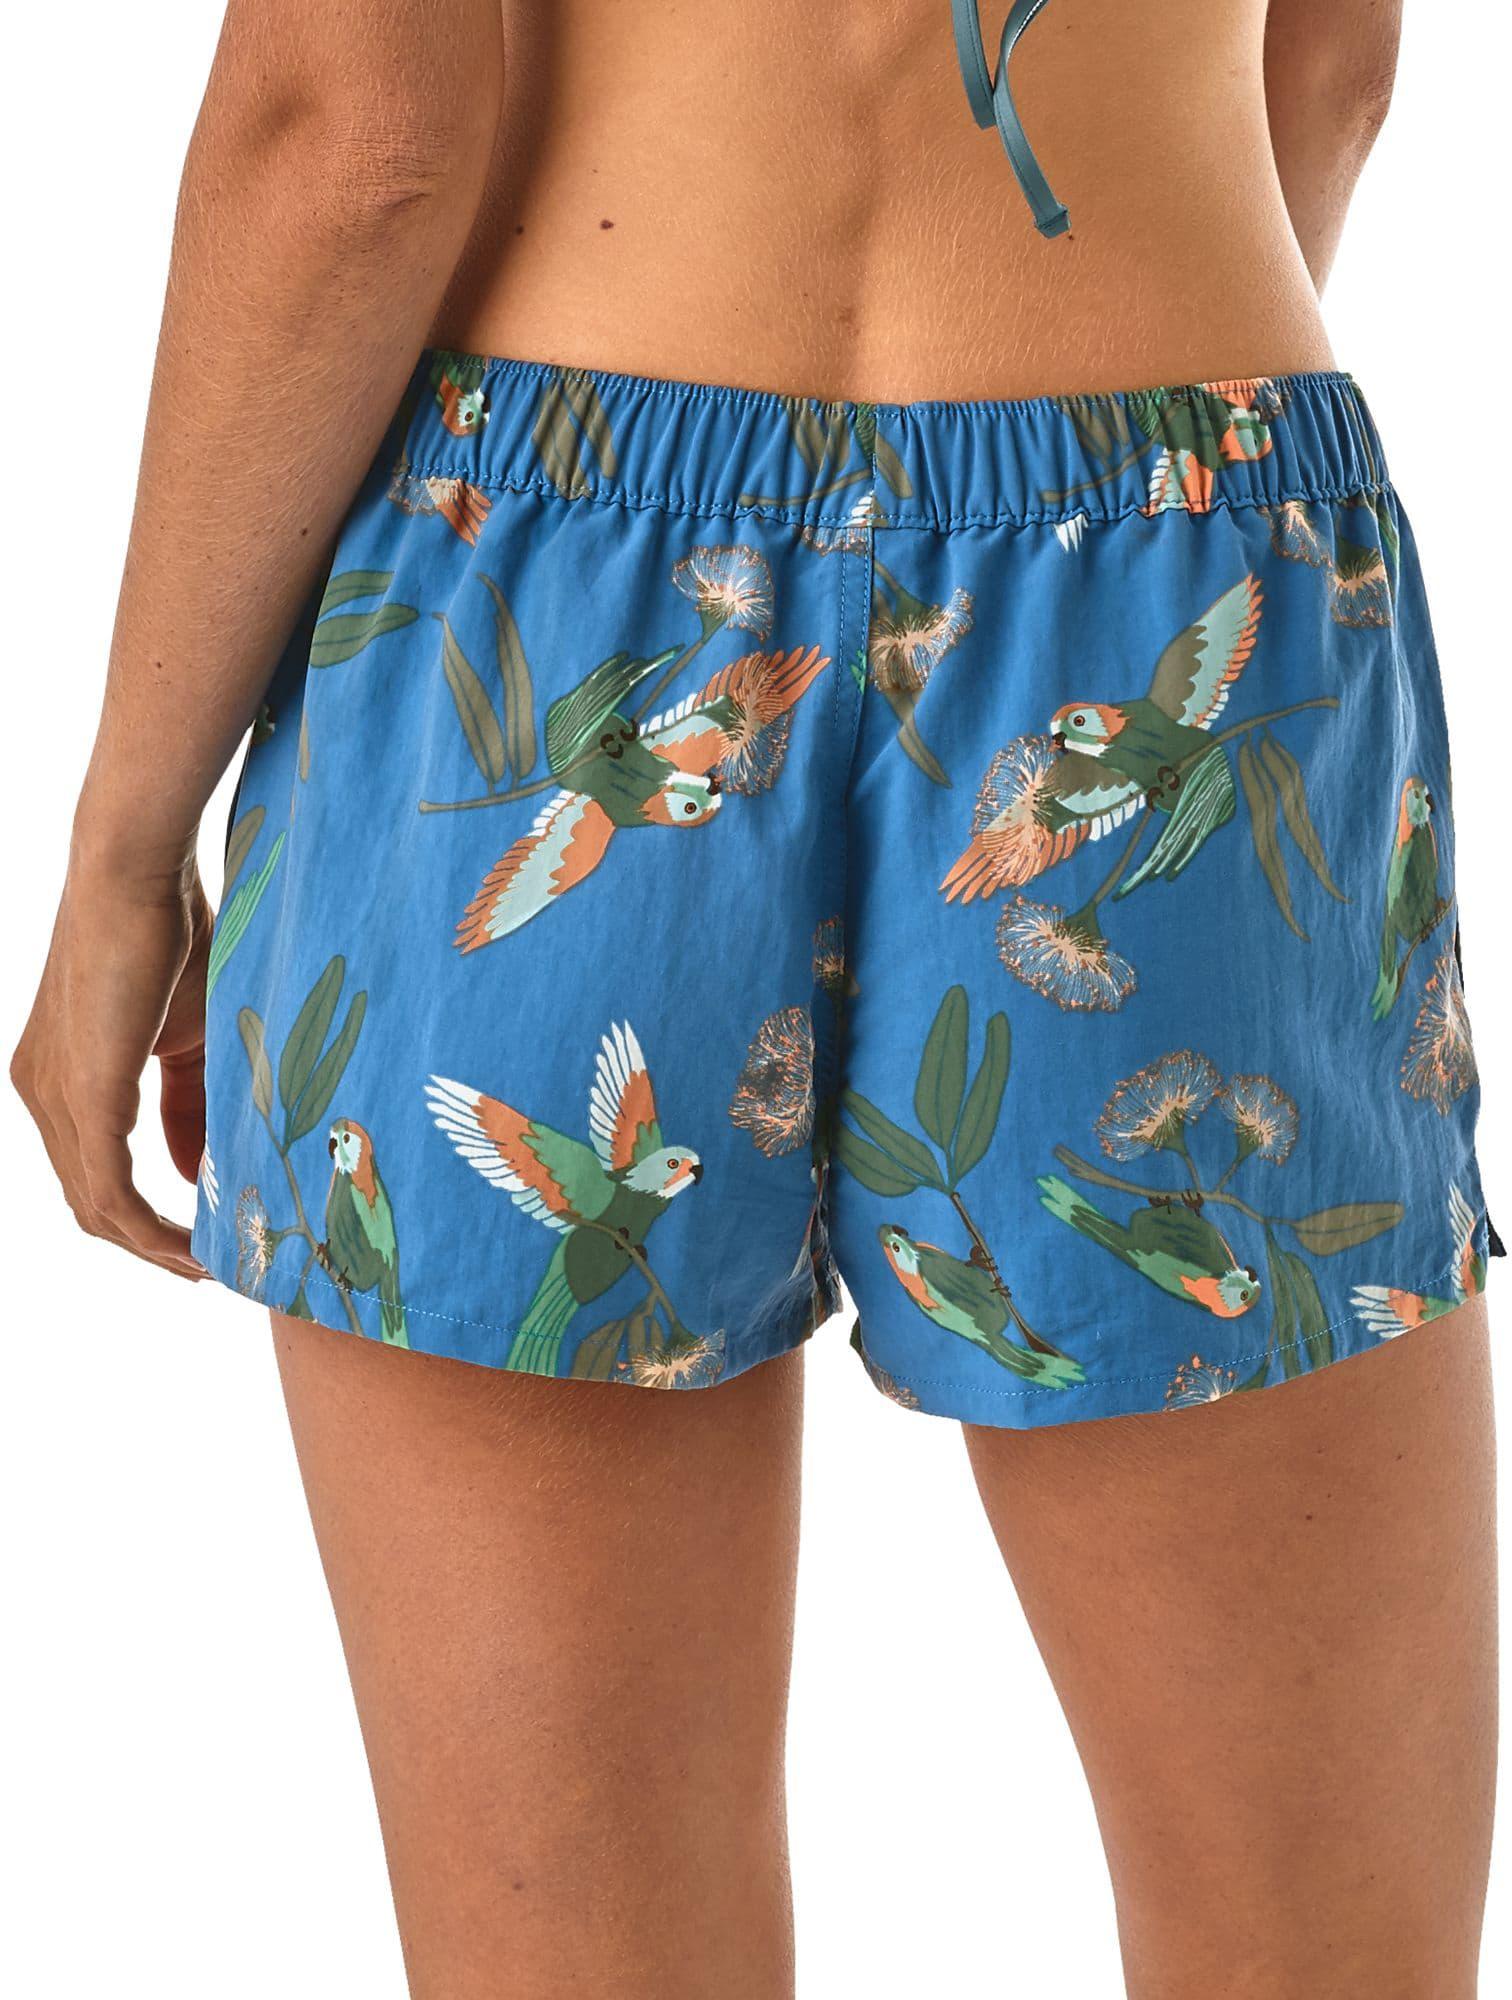 White Scrunch Butt Booty Shorts | BodyKandi